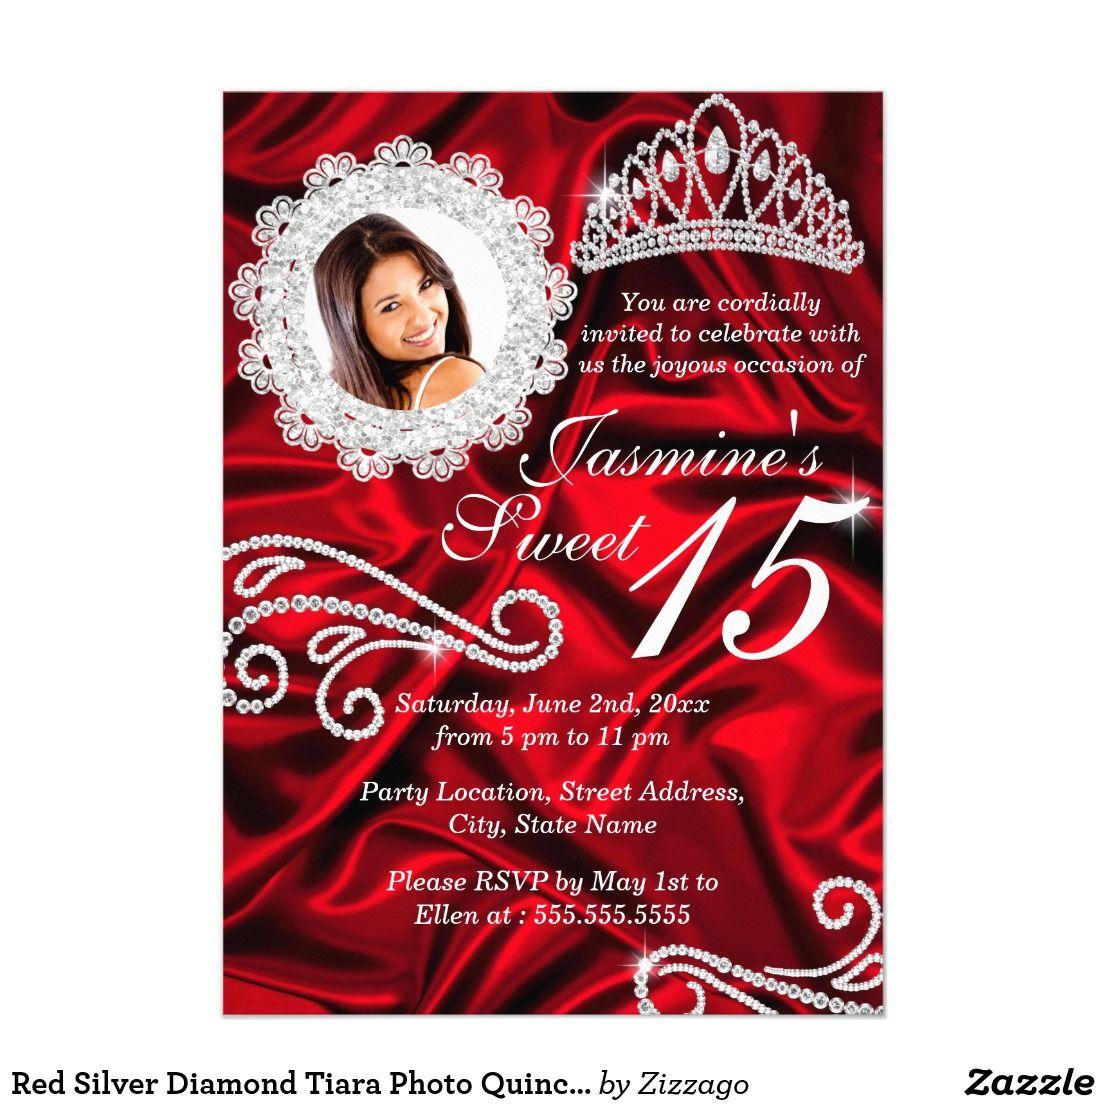 Red Silver Diamond Tiara Photo Quinceanera Invitation | Birthday ...